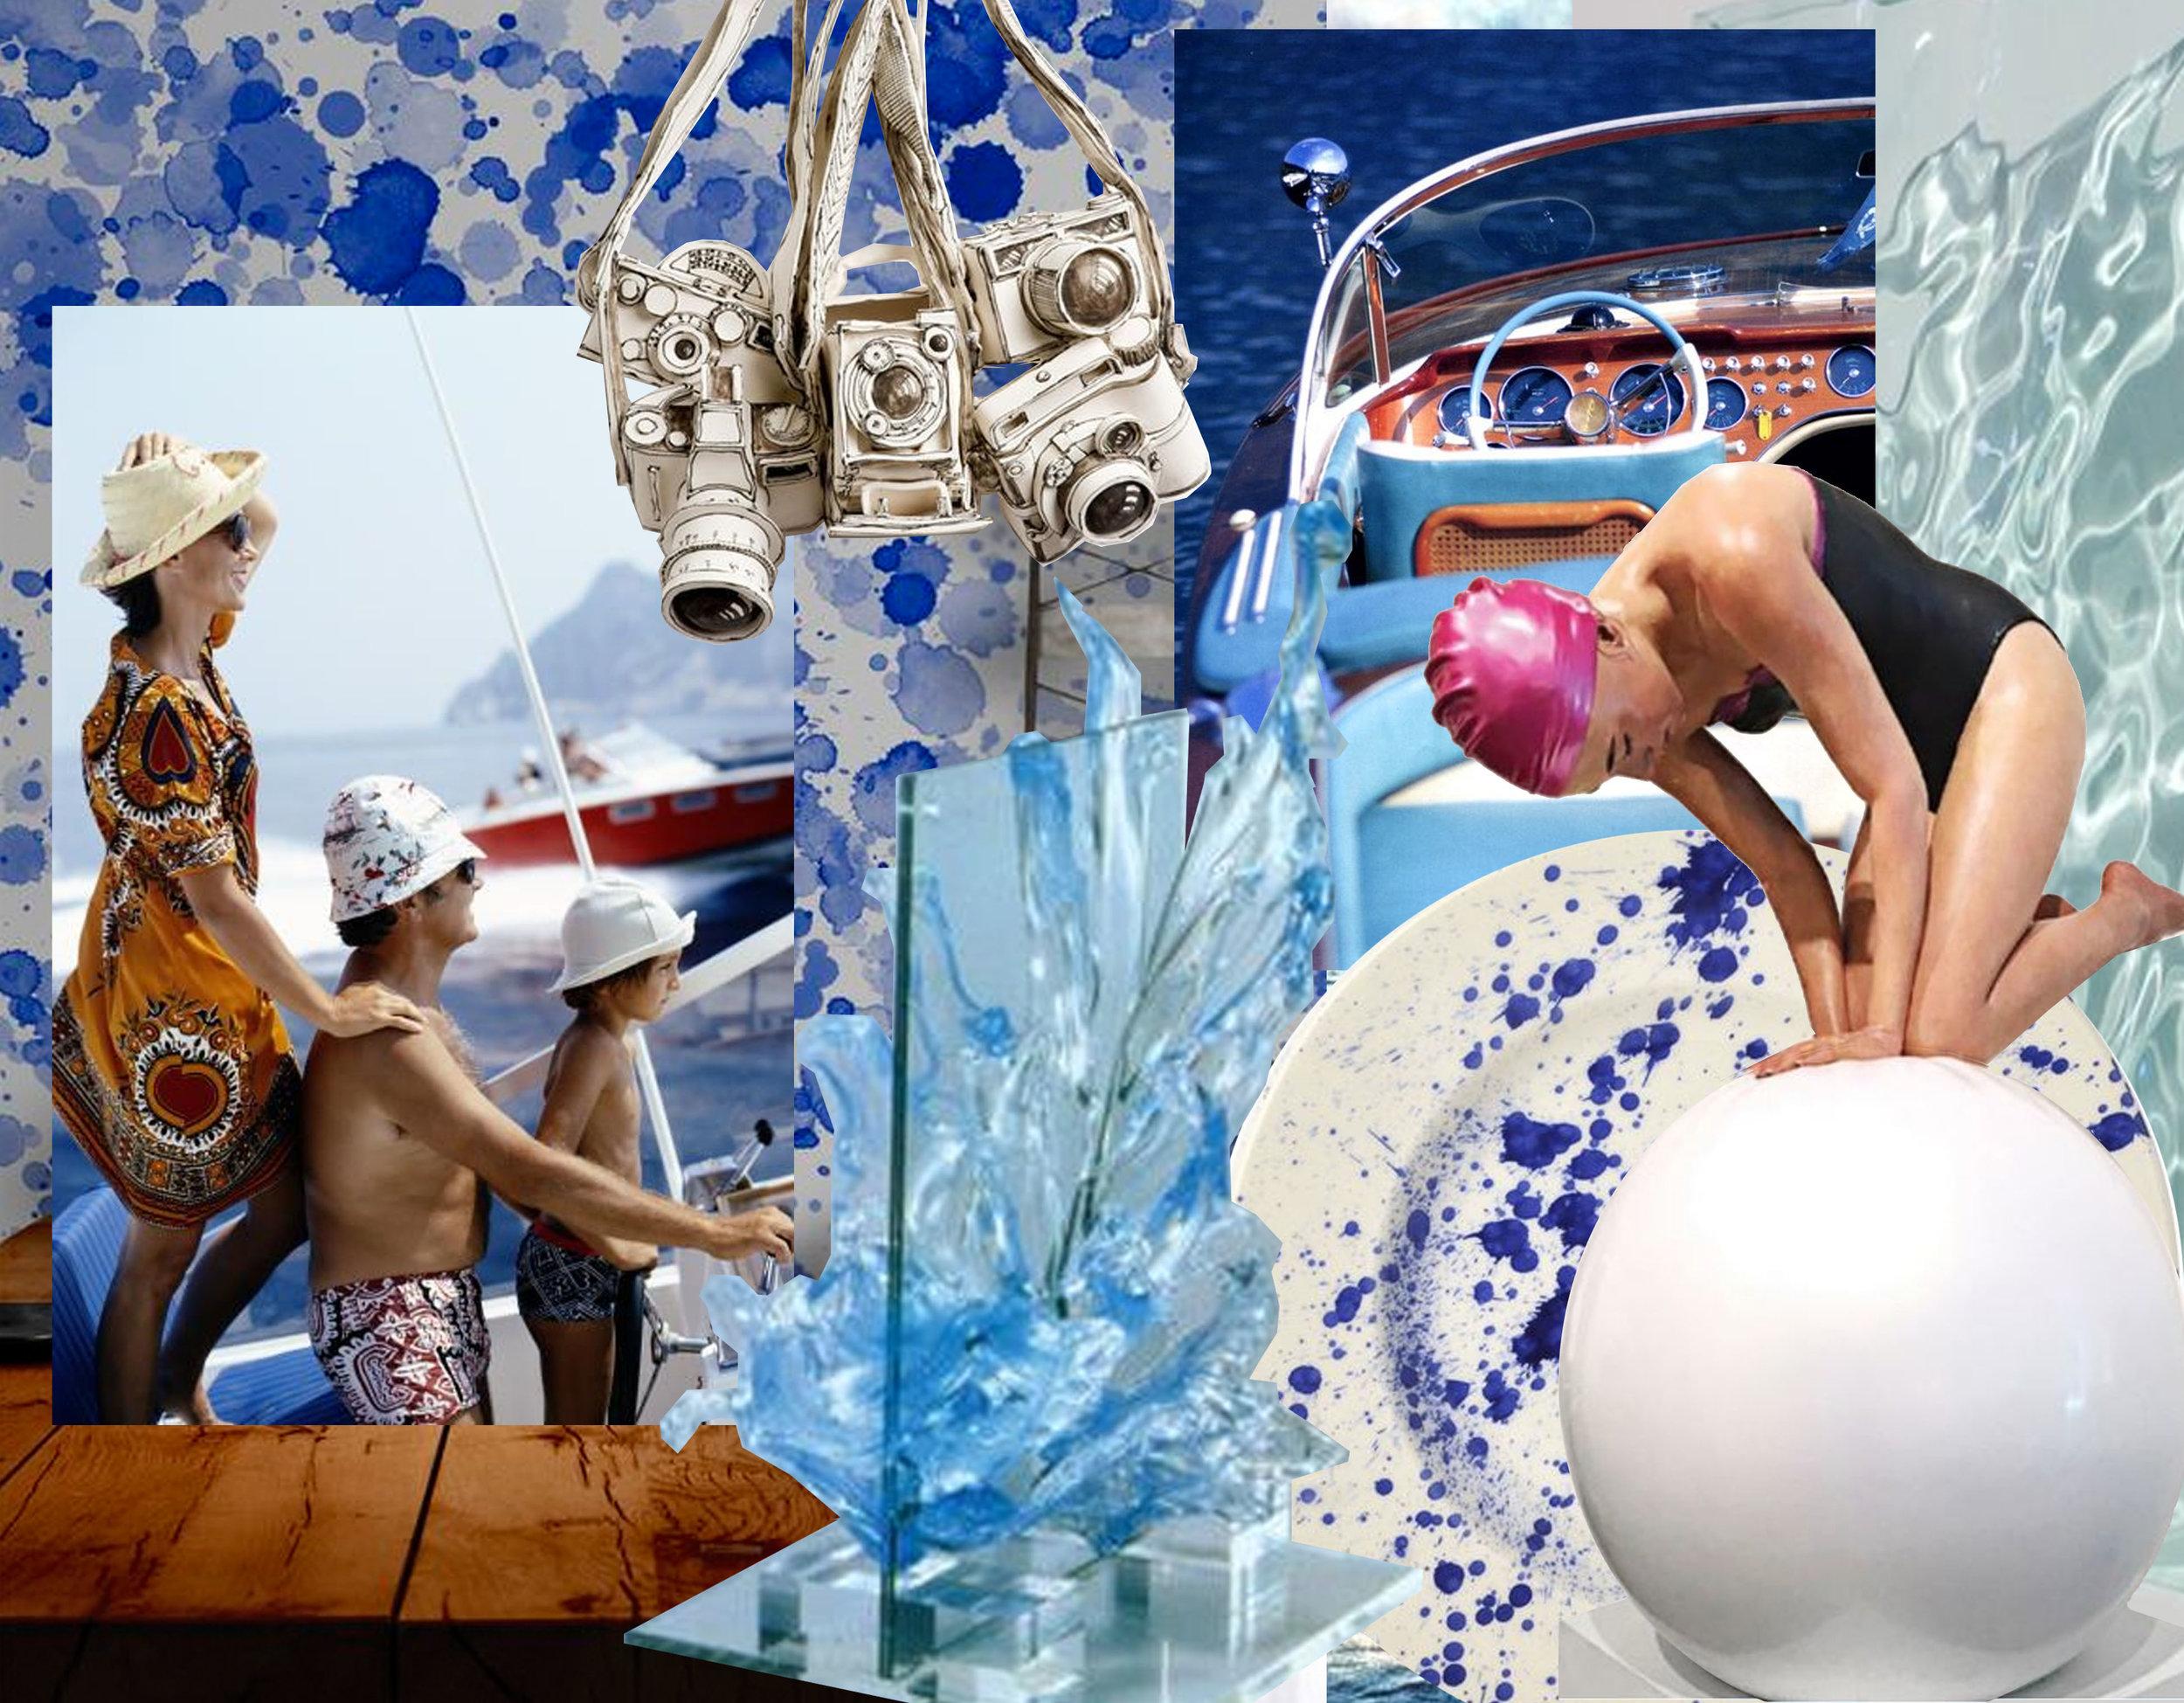 Blue Drops wallpaper via  Photowall - cameras are ceramic work of Katherine Morling via  The Jealous Curator  - water sculpture - boat image: Endless Summer meets Sim Aarons via  Trendland - Blue Splater plate via  Remodelista  - sculpture woman swimmer Carol Feuerman via  The Jealous Curator